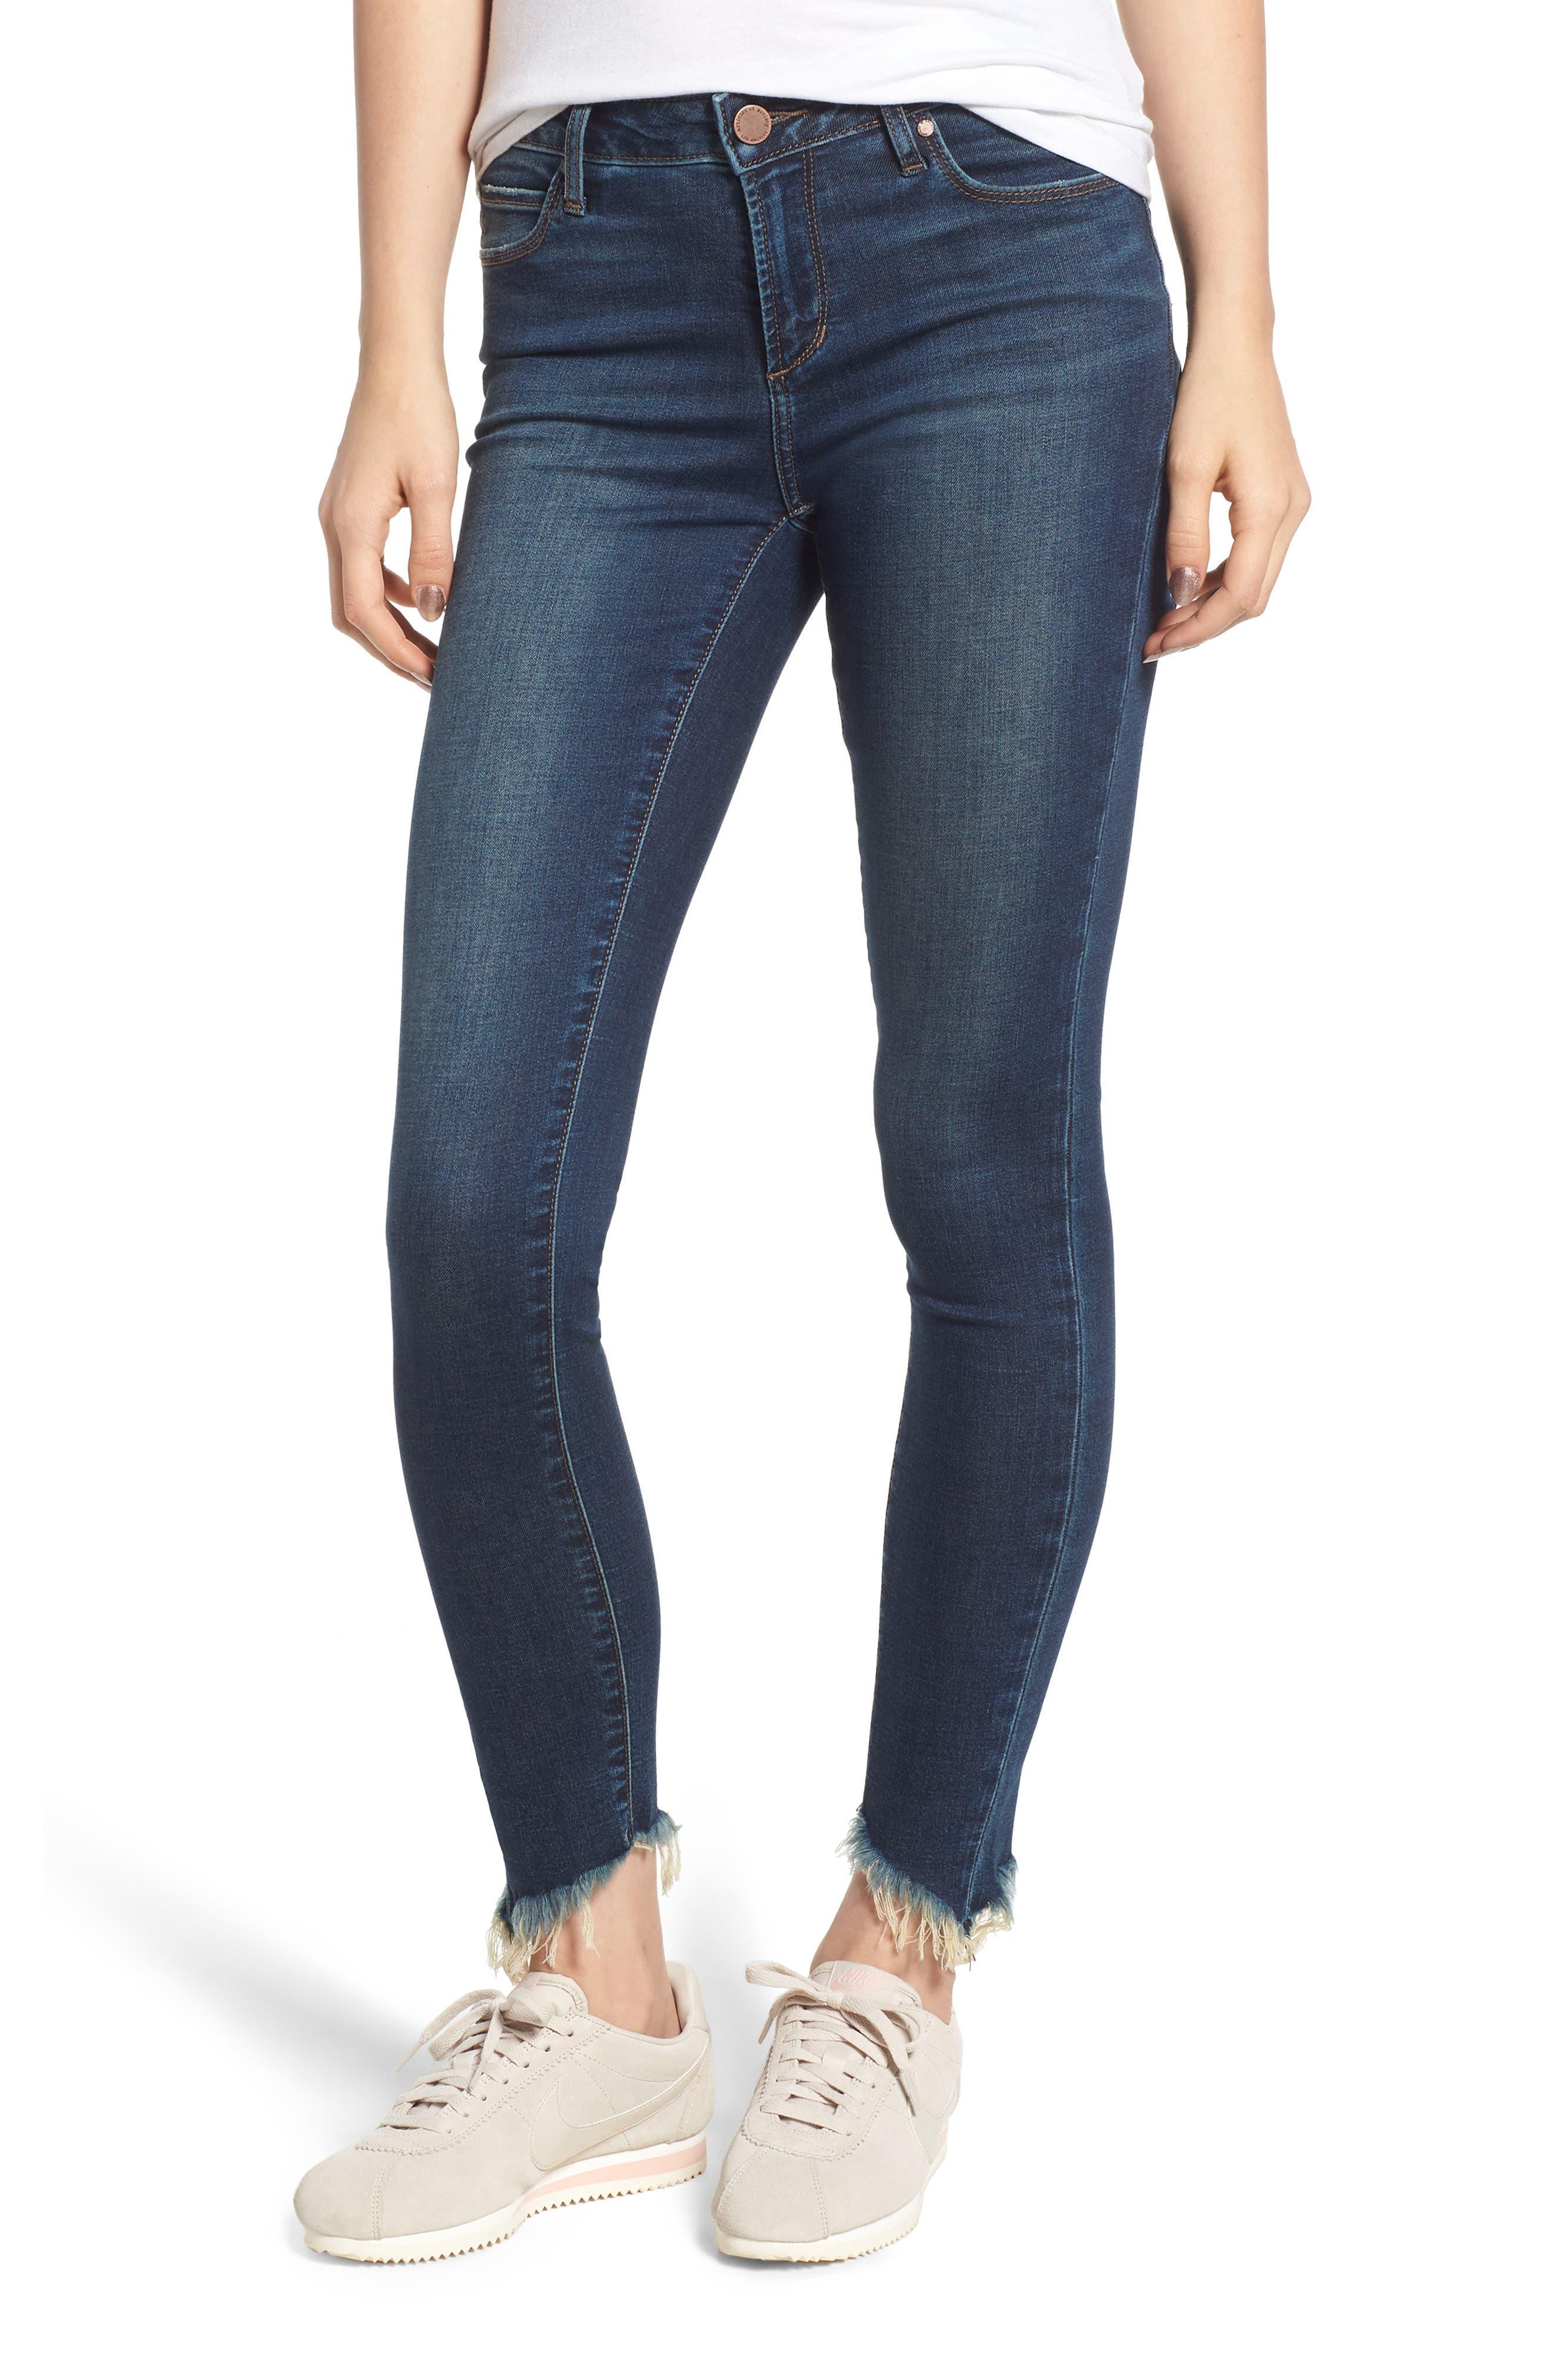 ARTICLES OF SOCIETY Sammy Fray Hem Skinny Jeans in Providence